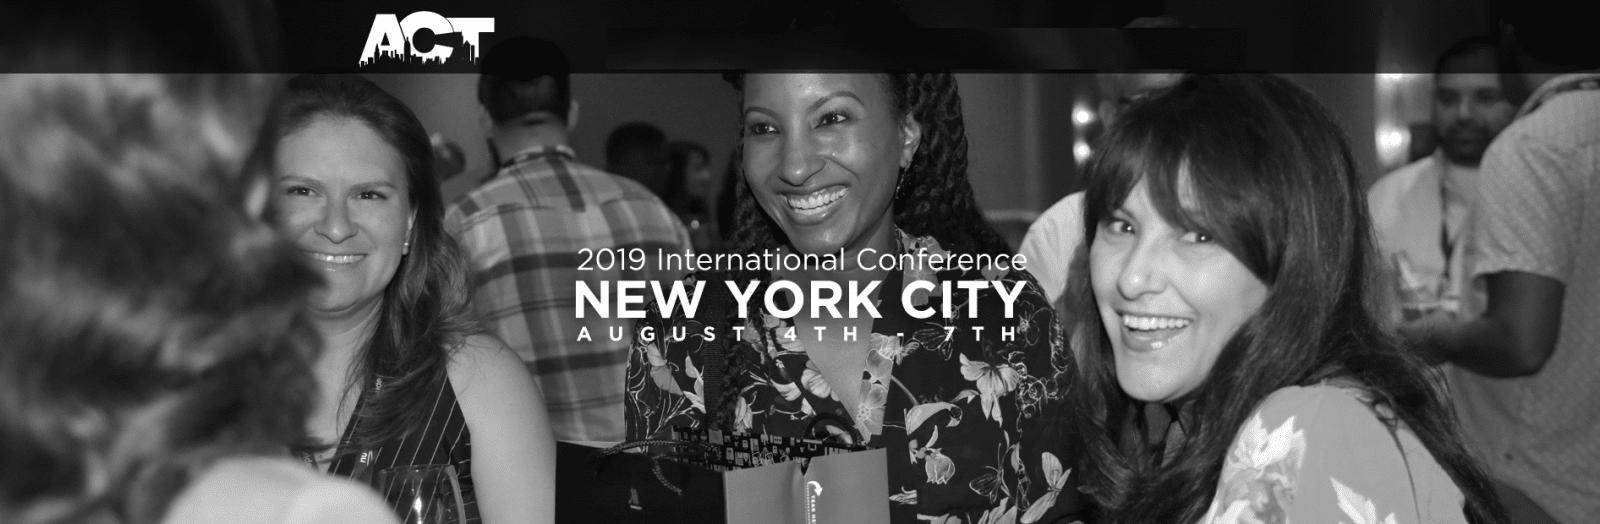 international conference new york city